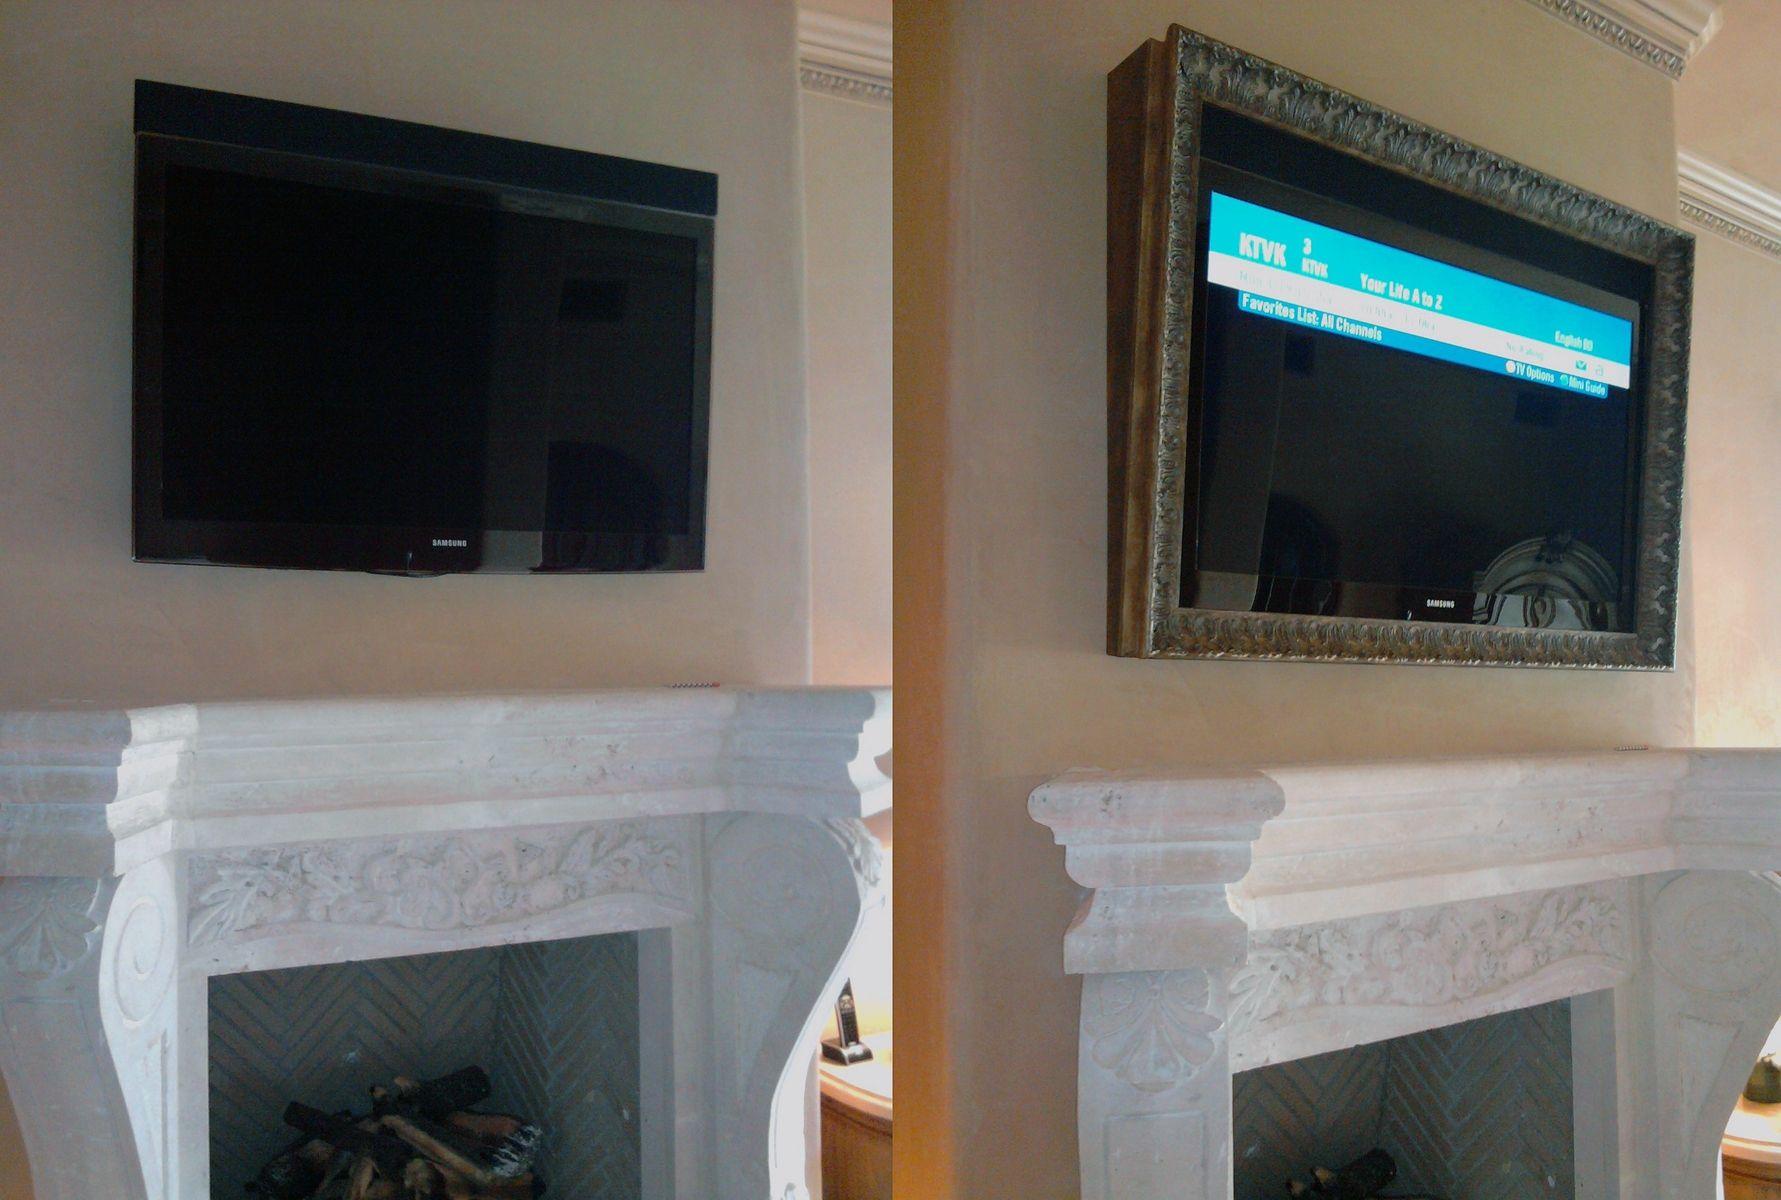 Custom Tv Frame by Frames For Flat Screens | CustomMade.com